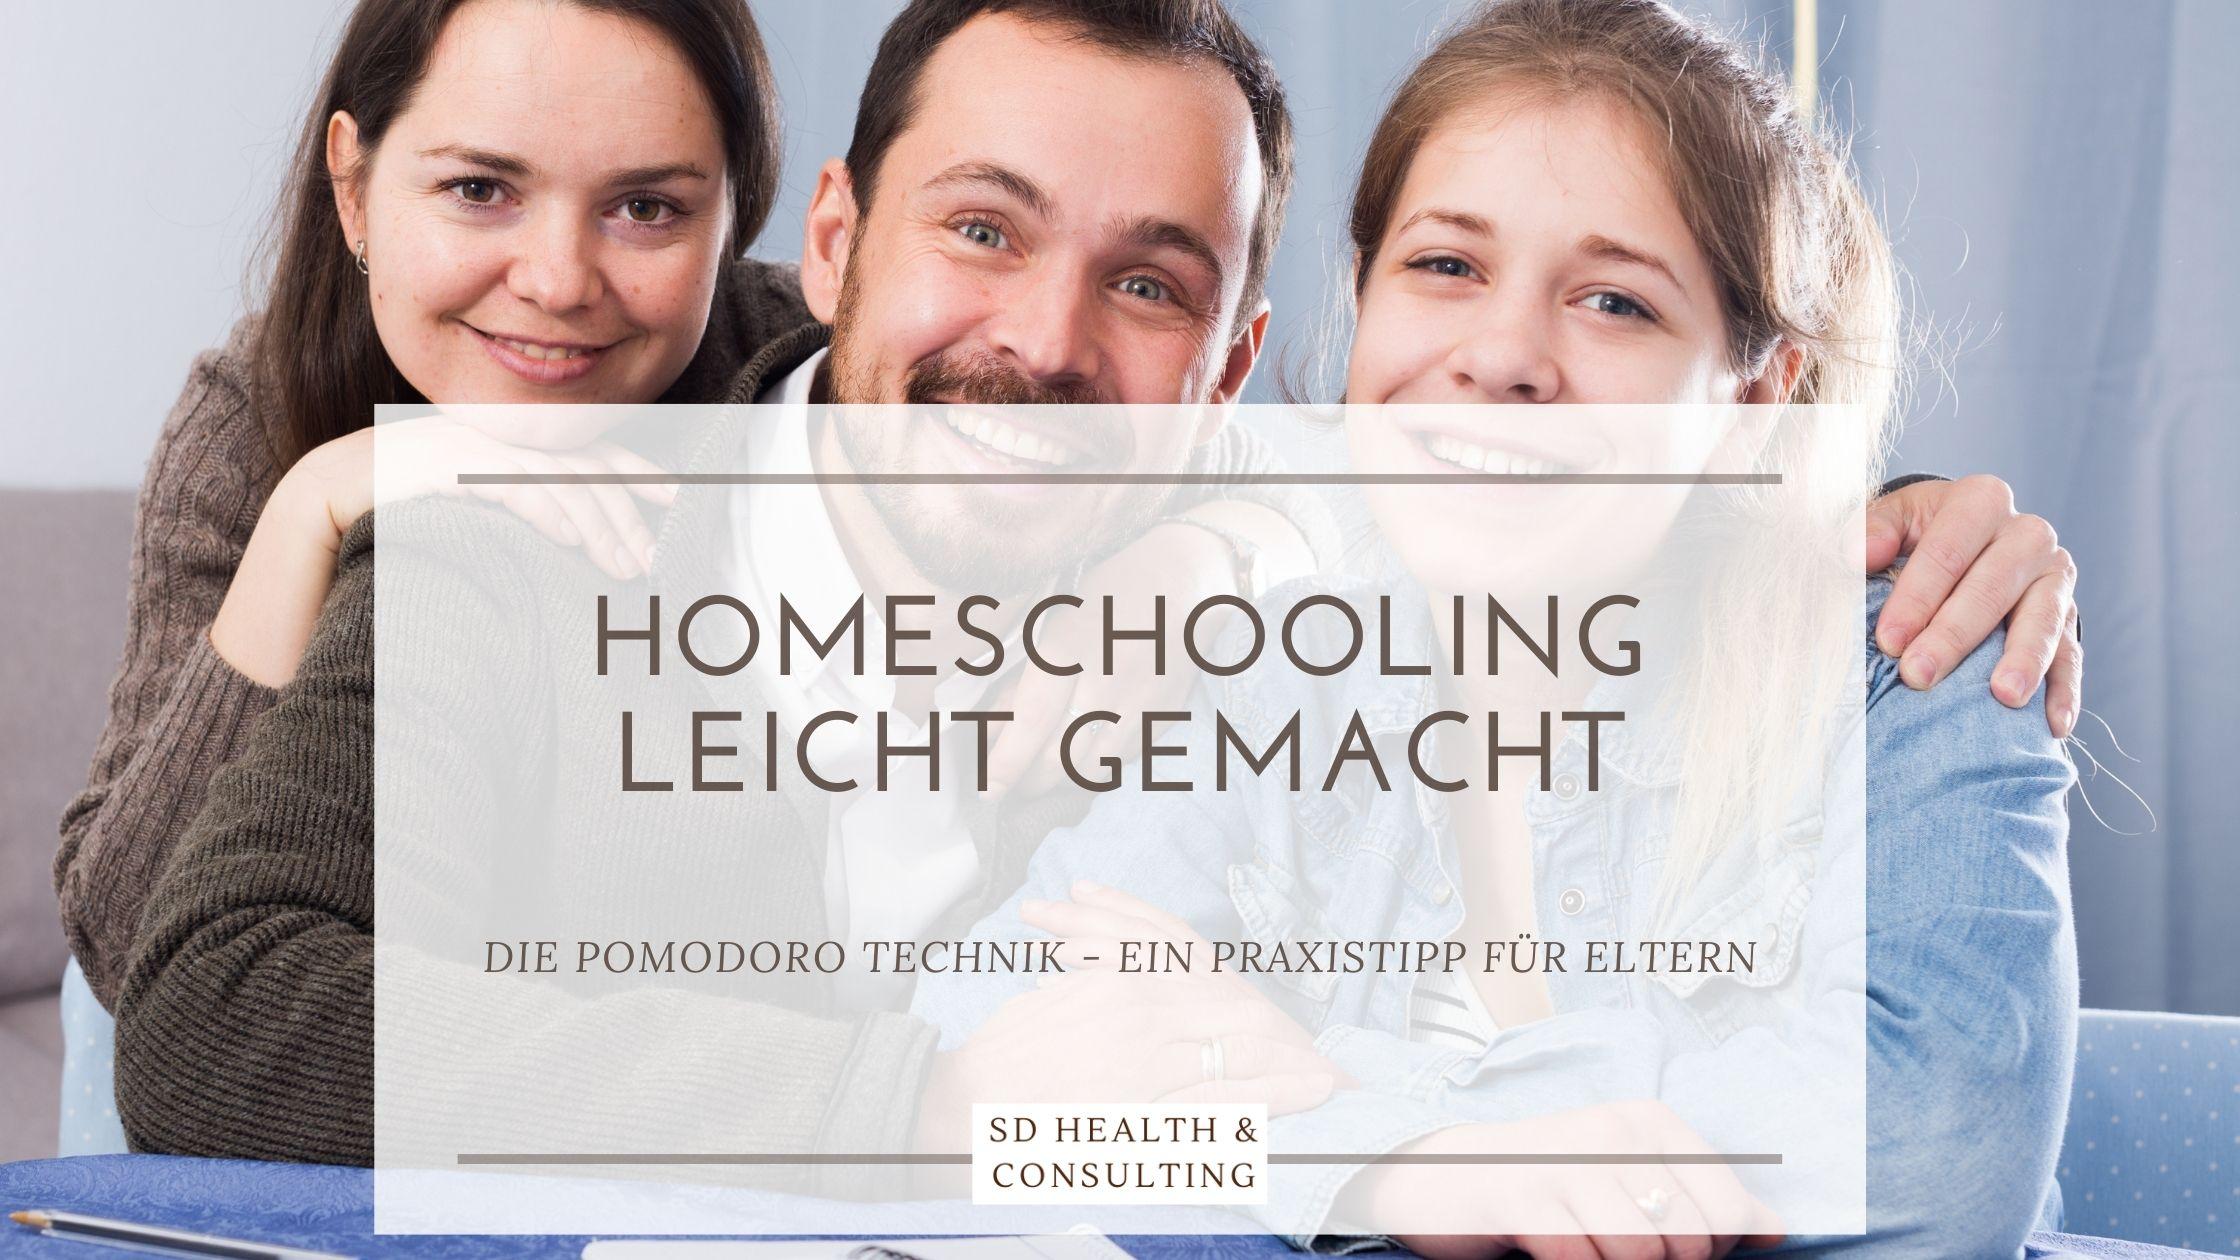 Homeschooling, Pomodoro